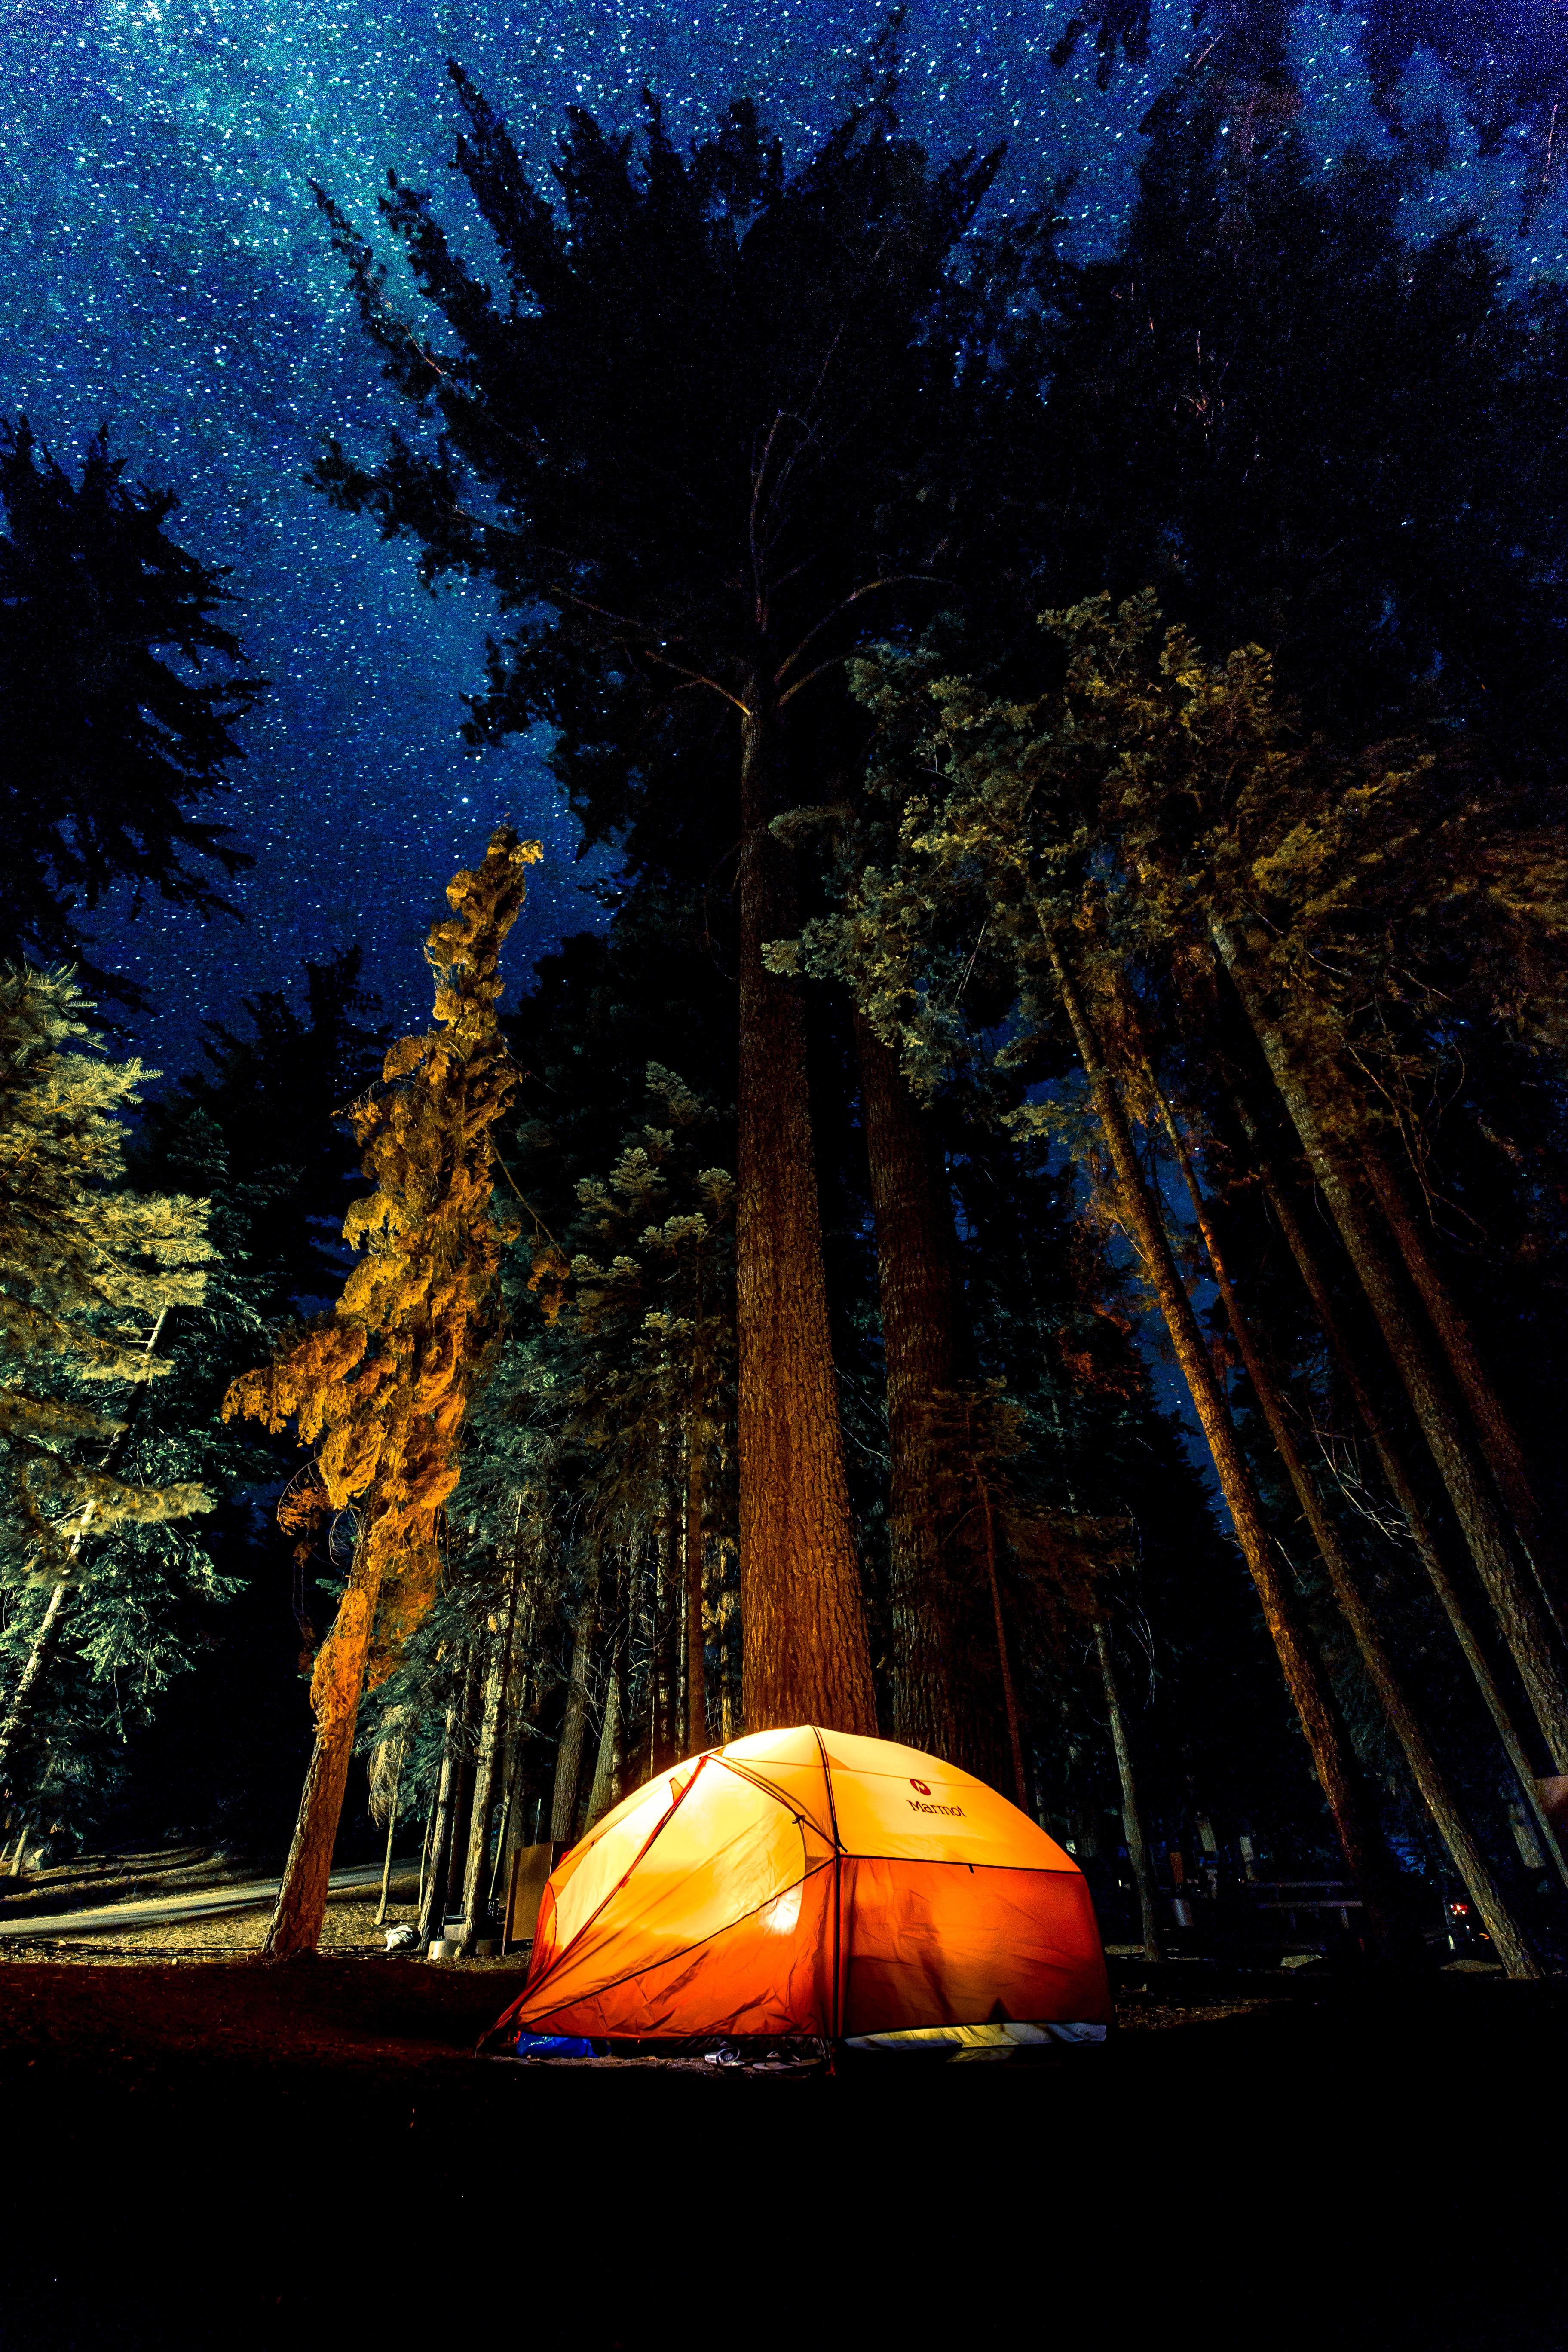 Best Remote-Control Camping Lantern